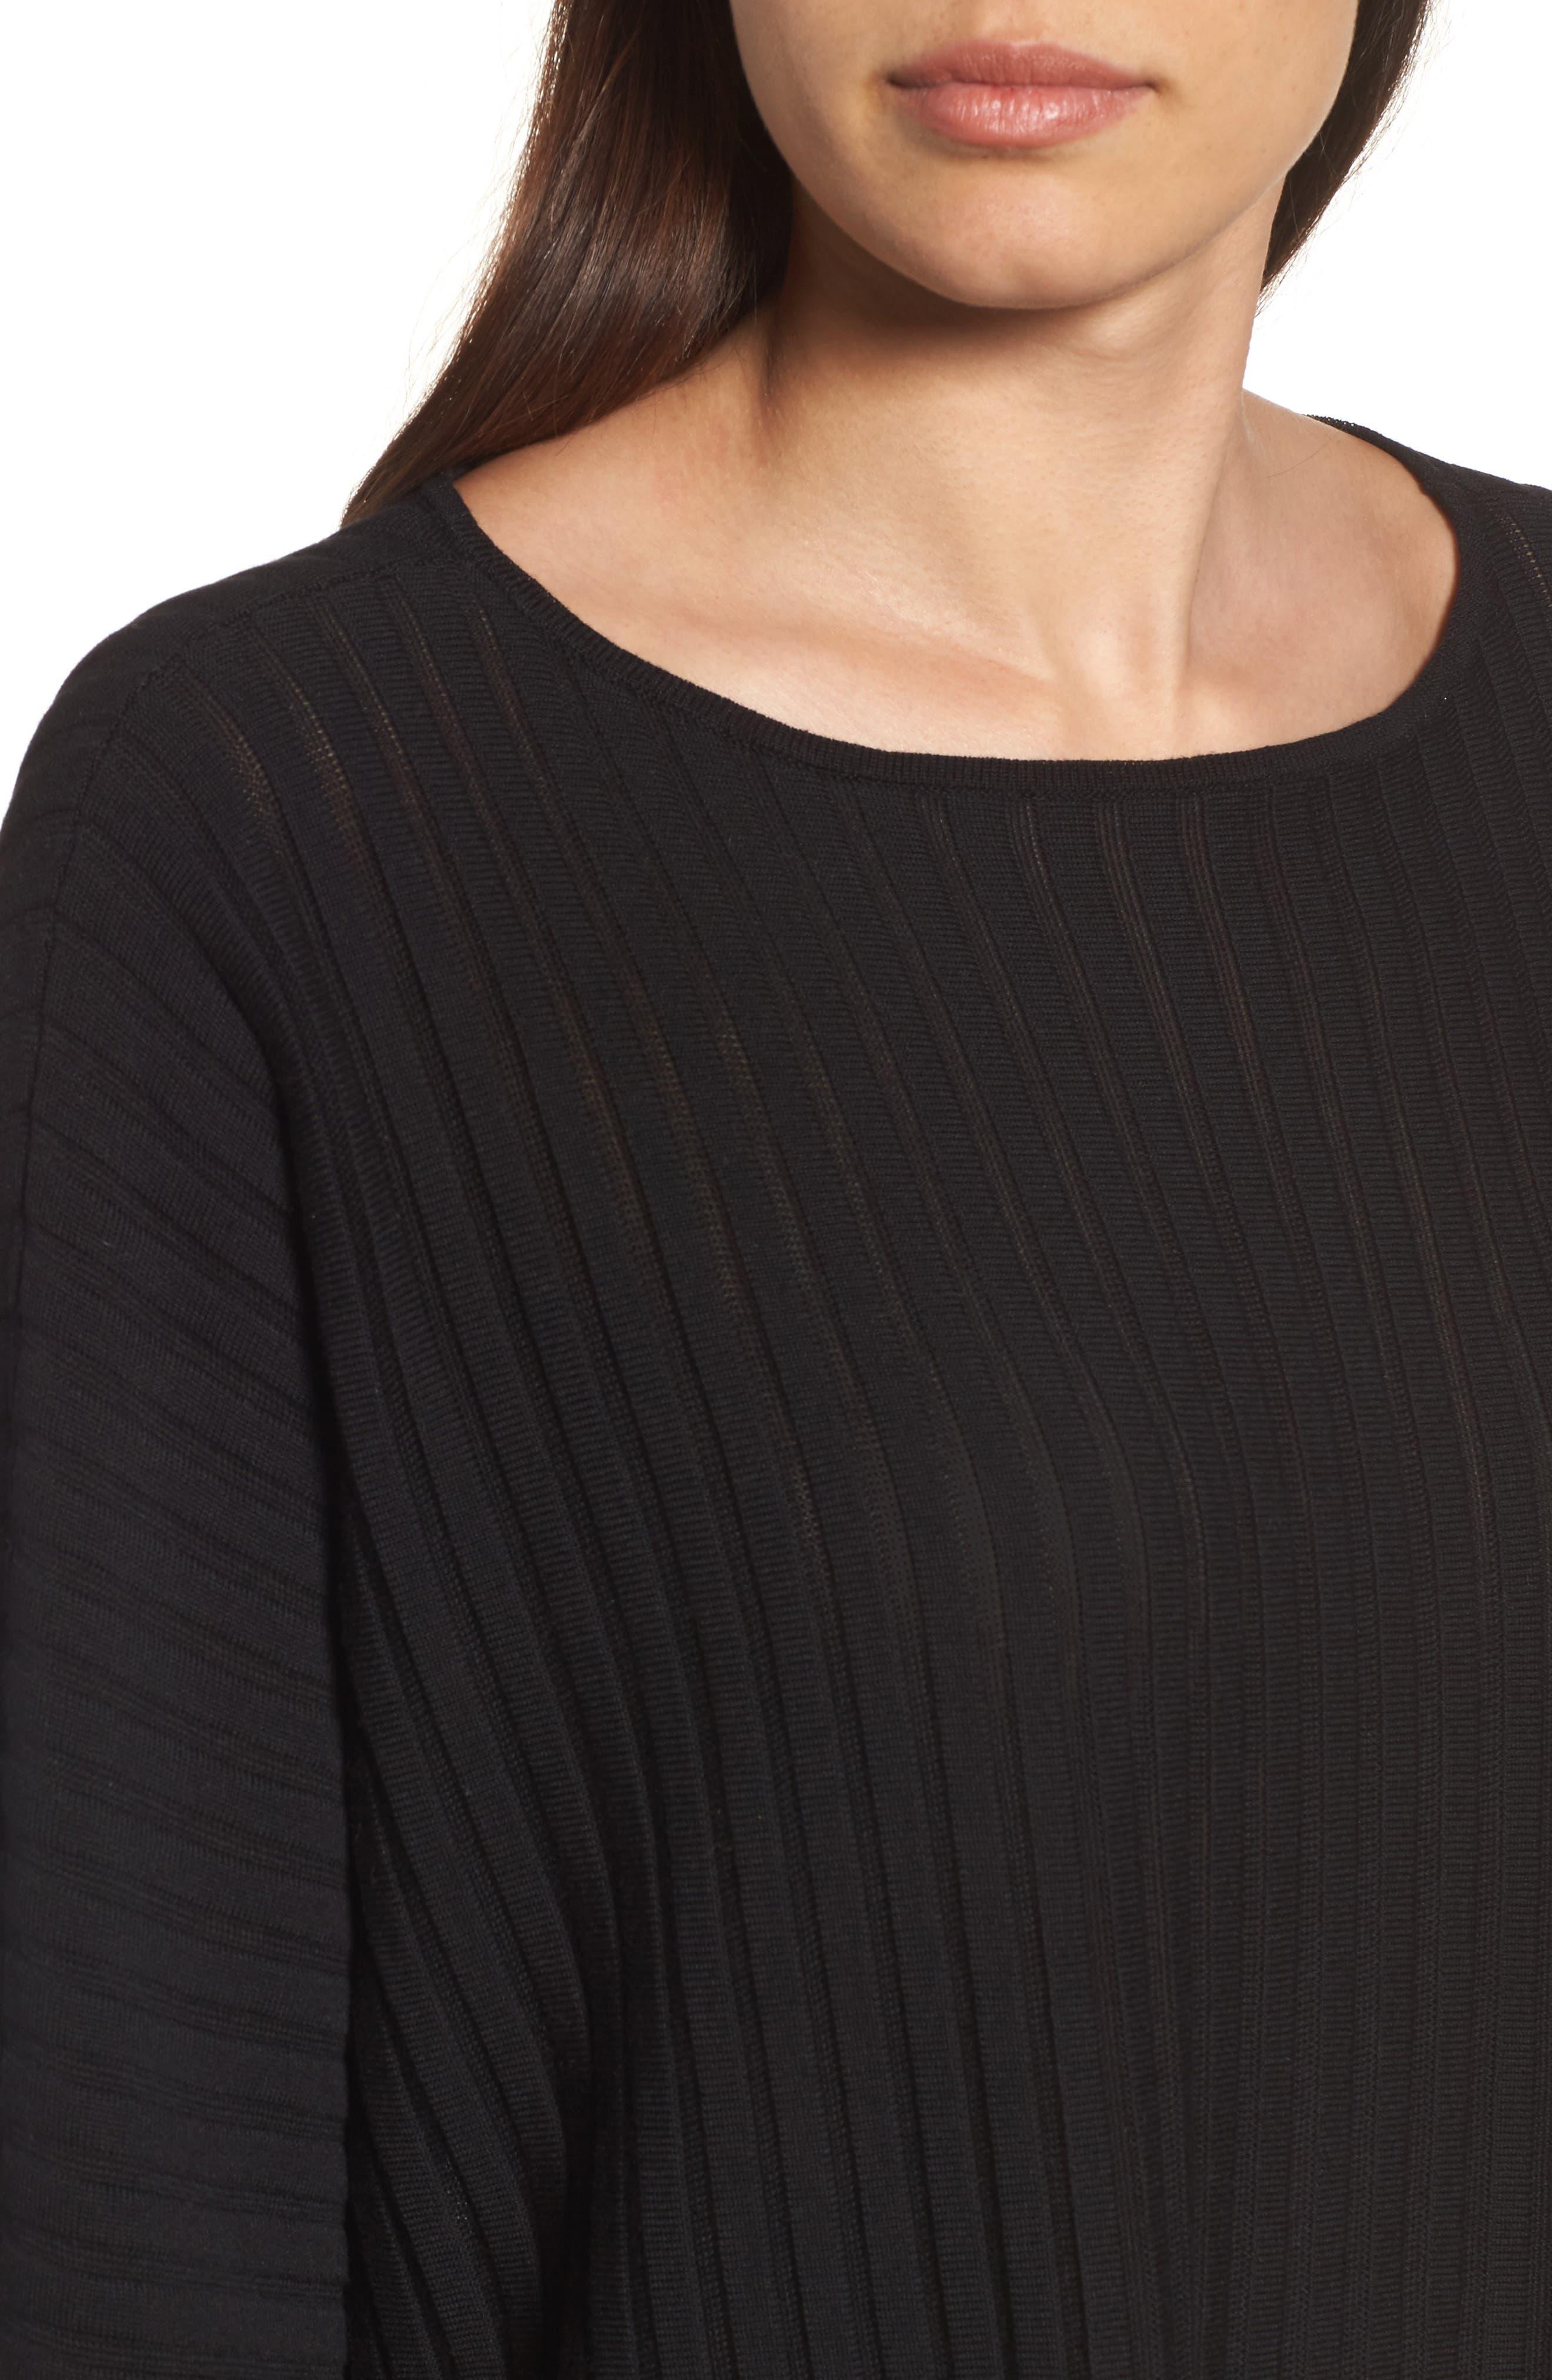 Ribbed Bateau Neck Sweater,                             Alternate thumbnail 13, color,